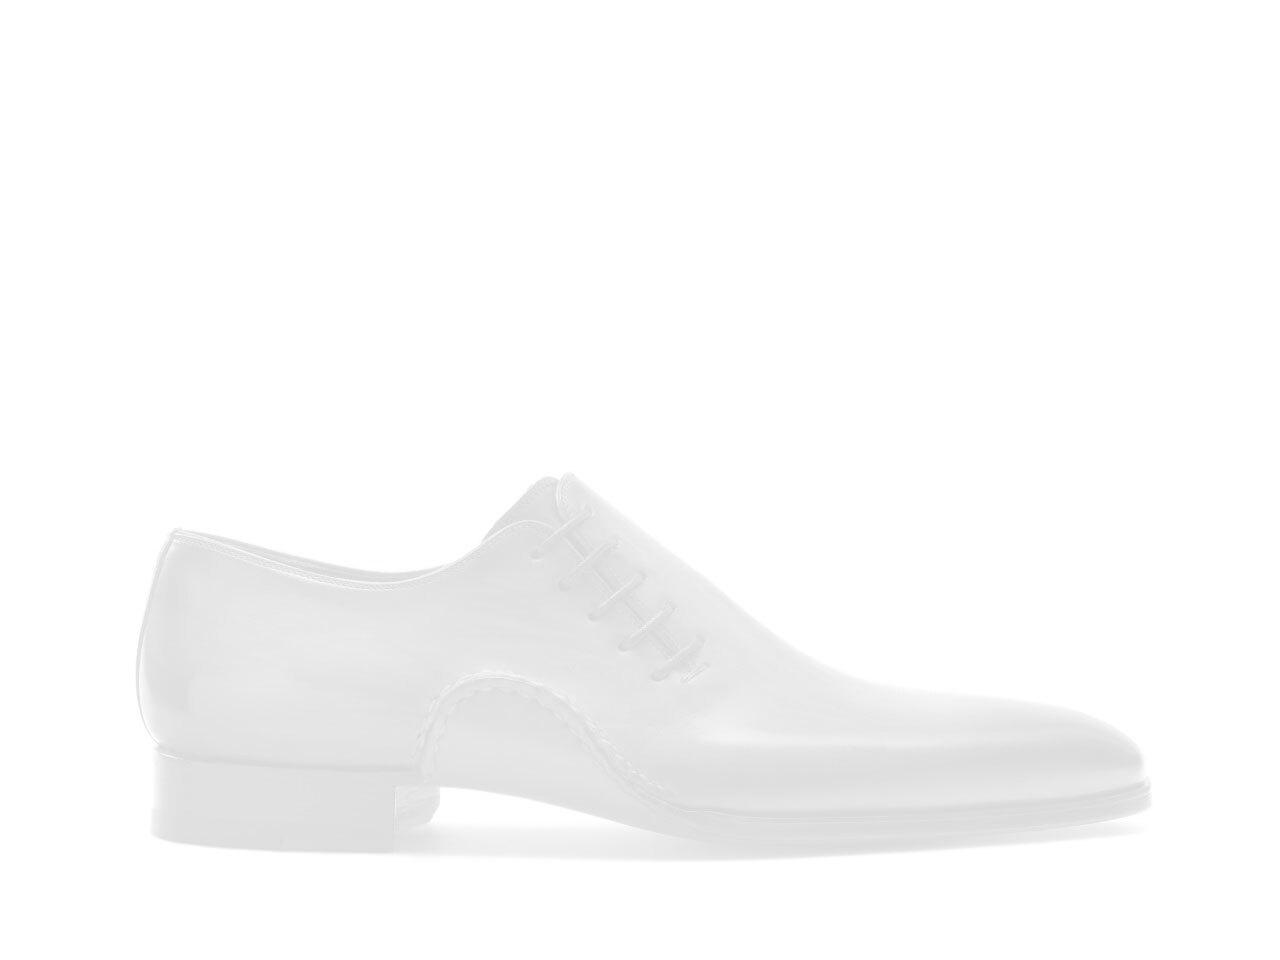 Pair of the Magnanni Mancera Brown Suede Men's Derby Shoes